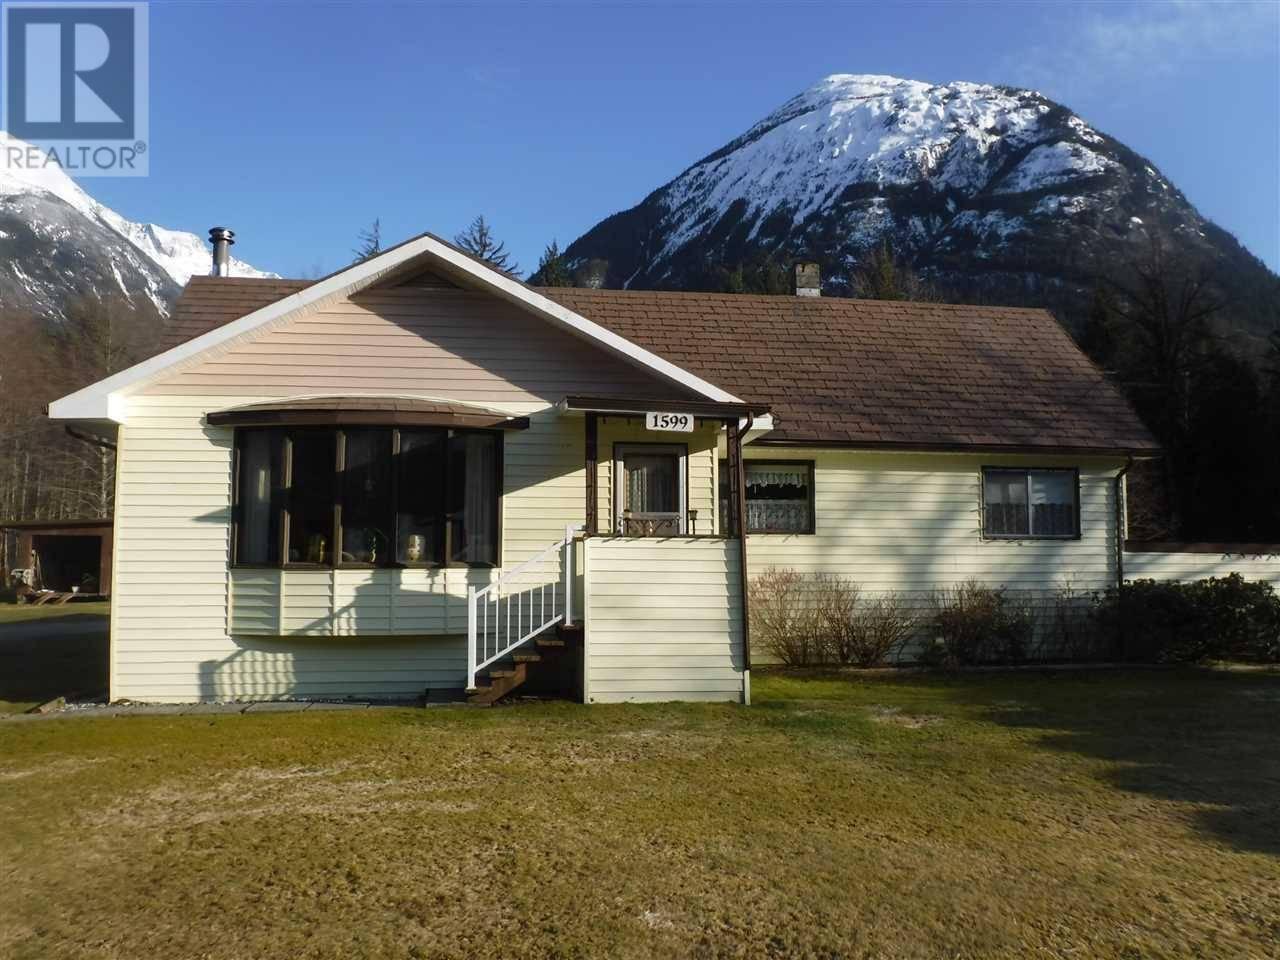 House for sale at 1599 Mackenzie Hy Bella Coola British Columbia - MLS: R2449026